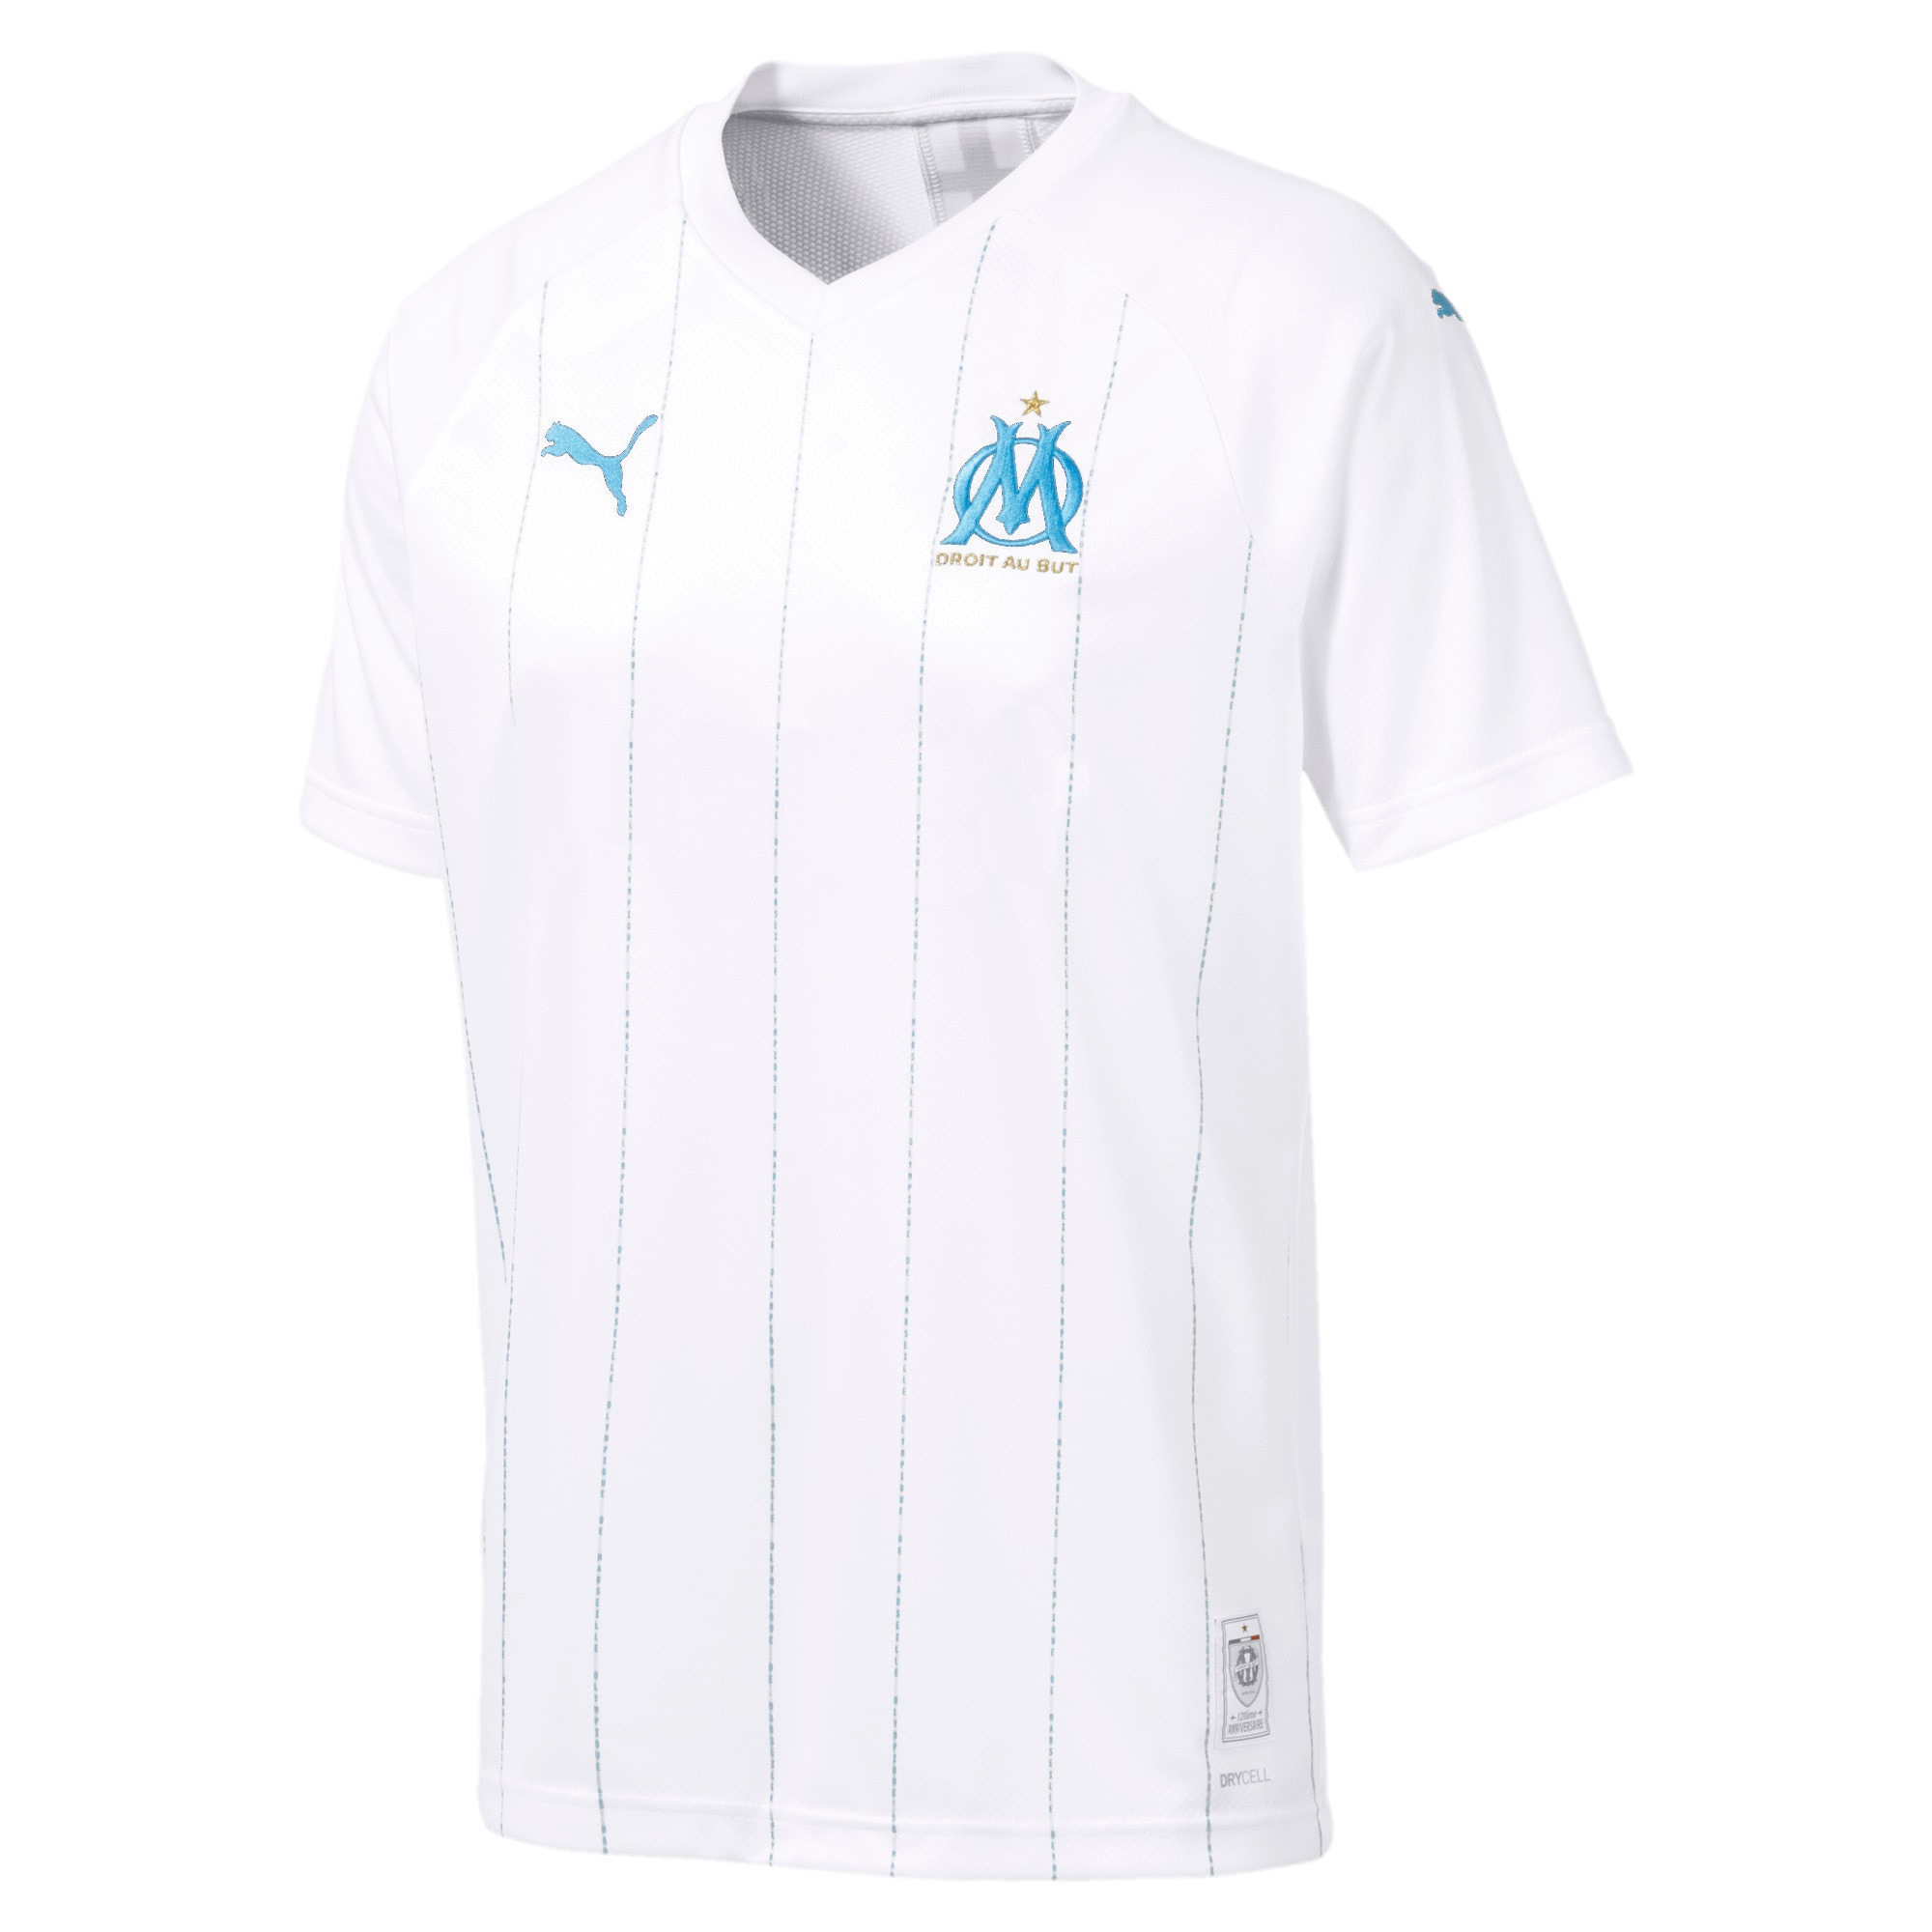 Thumbnail 1 of Olympique de Marseille Men's Home Replica Jersey, Puma White-Bleu Azur, medium